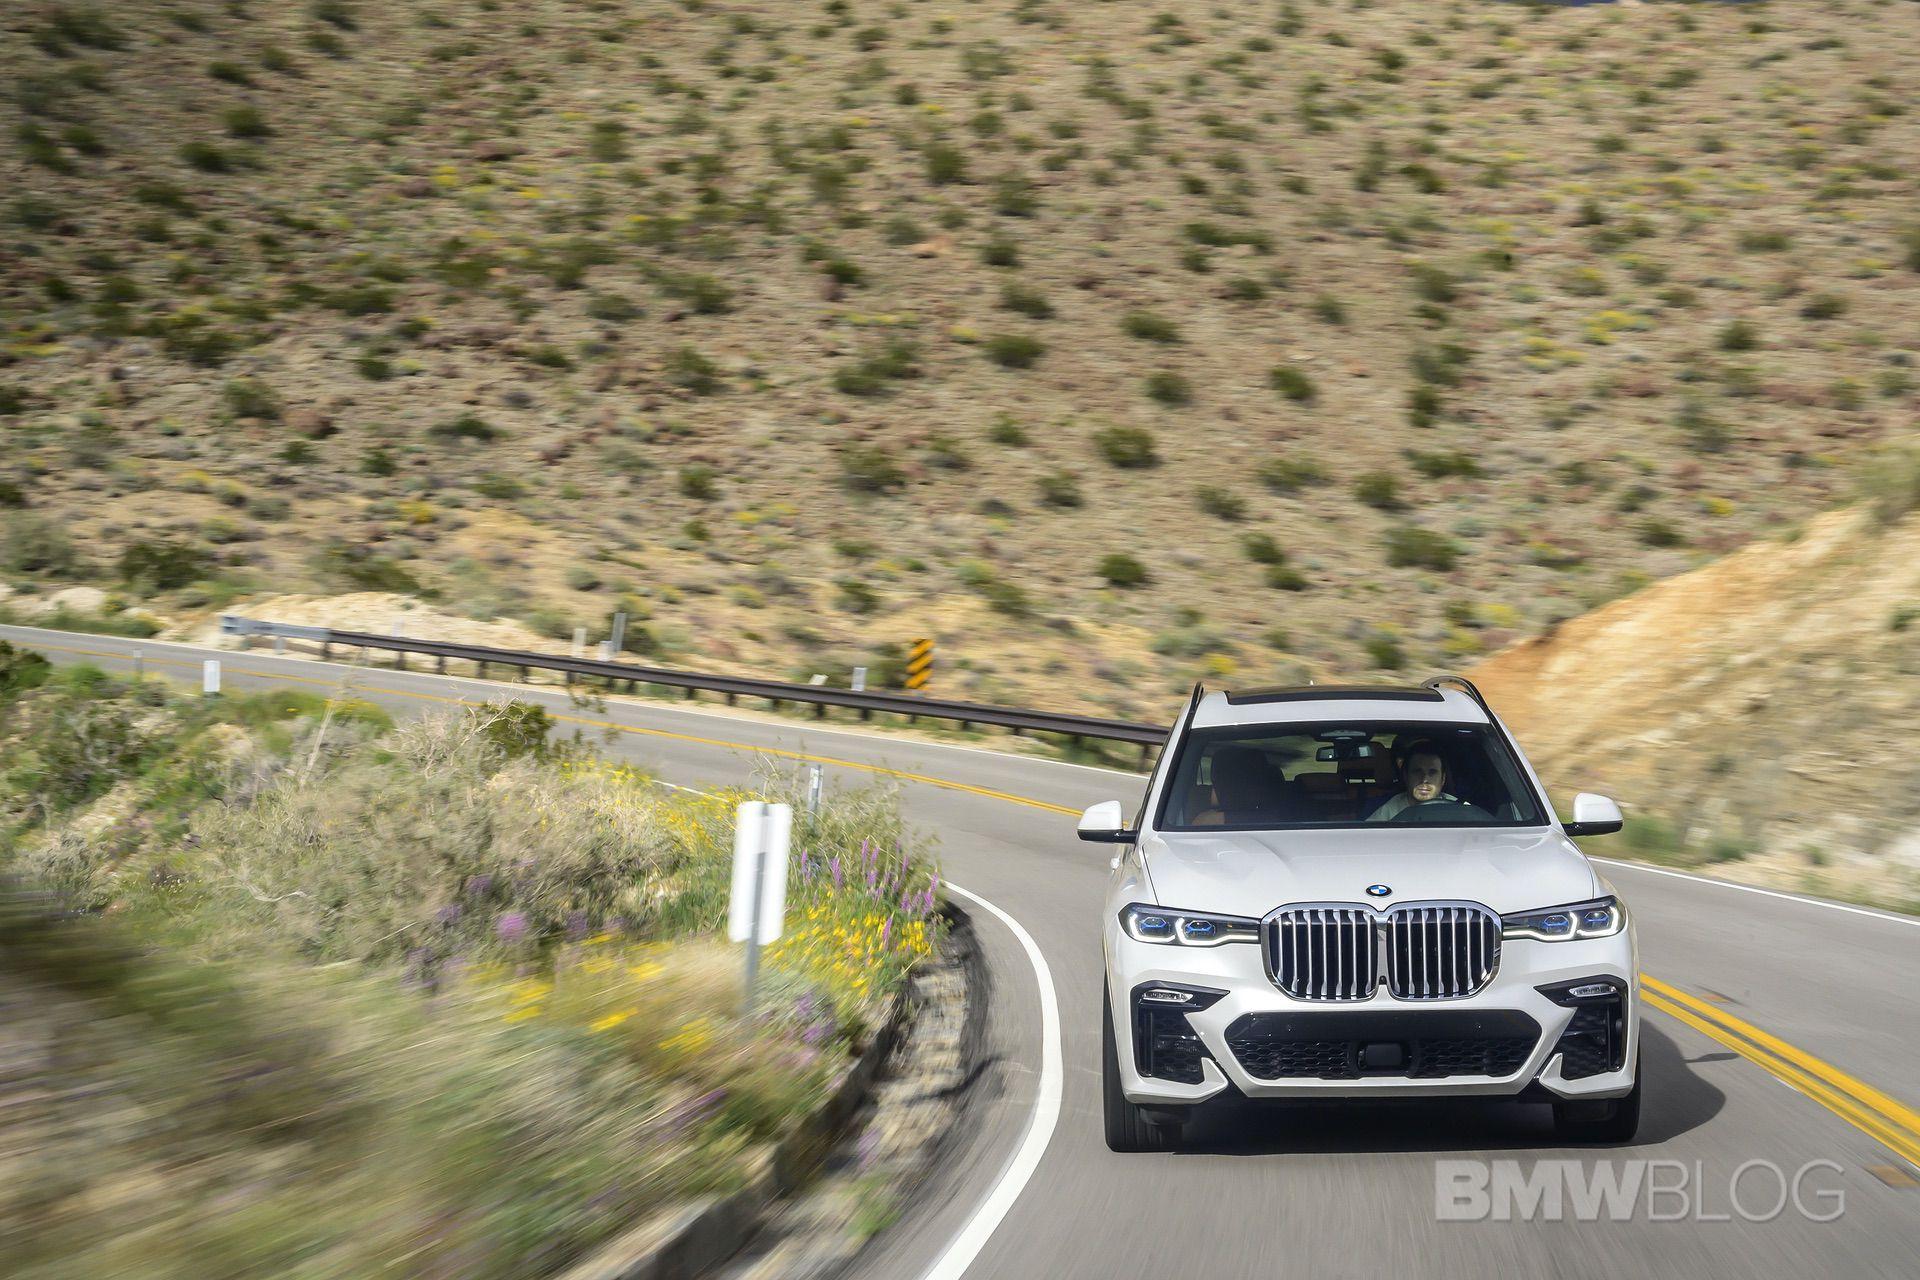 2019 BMW X7 drive 16